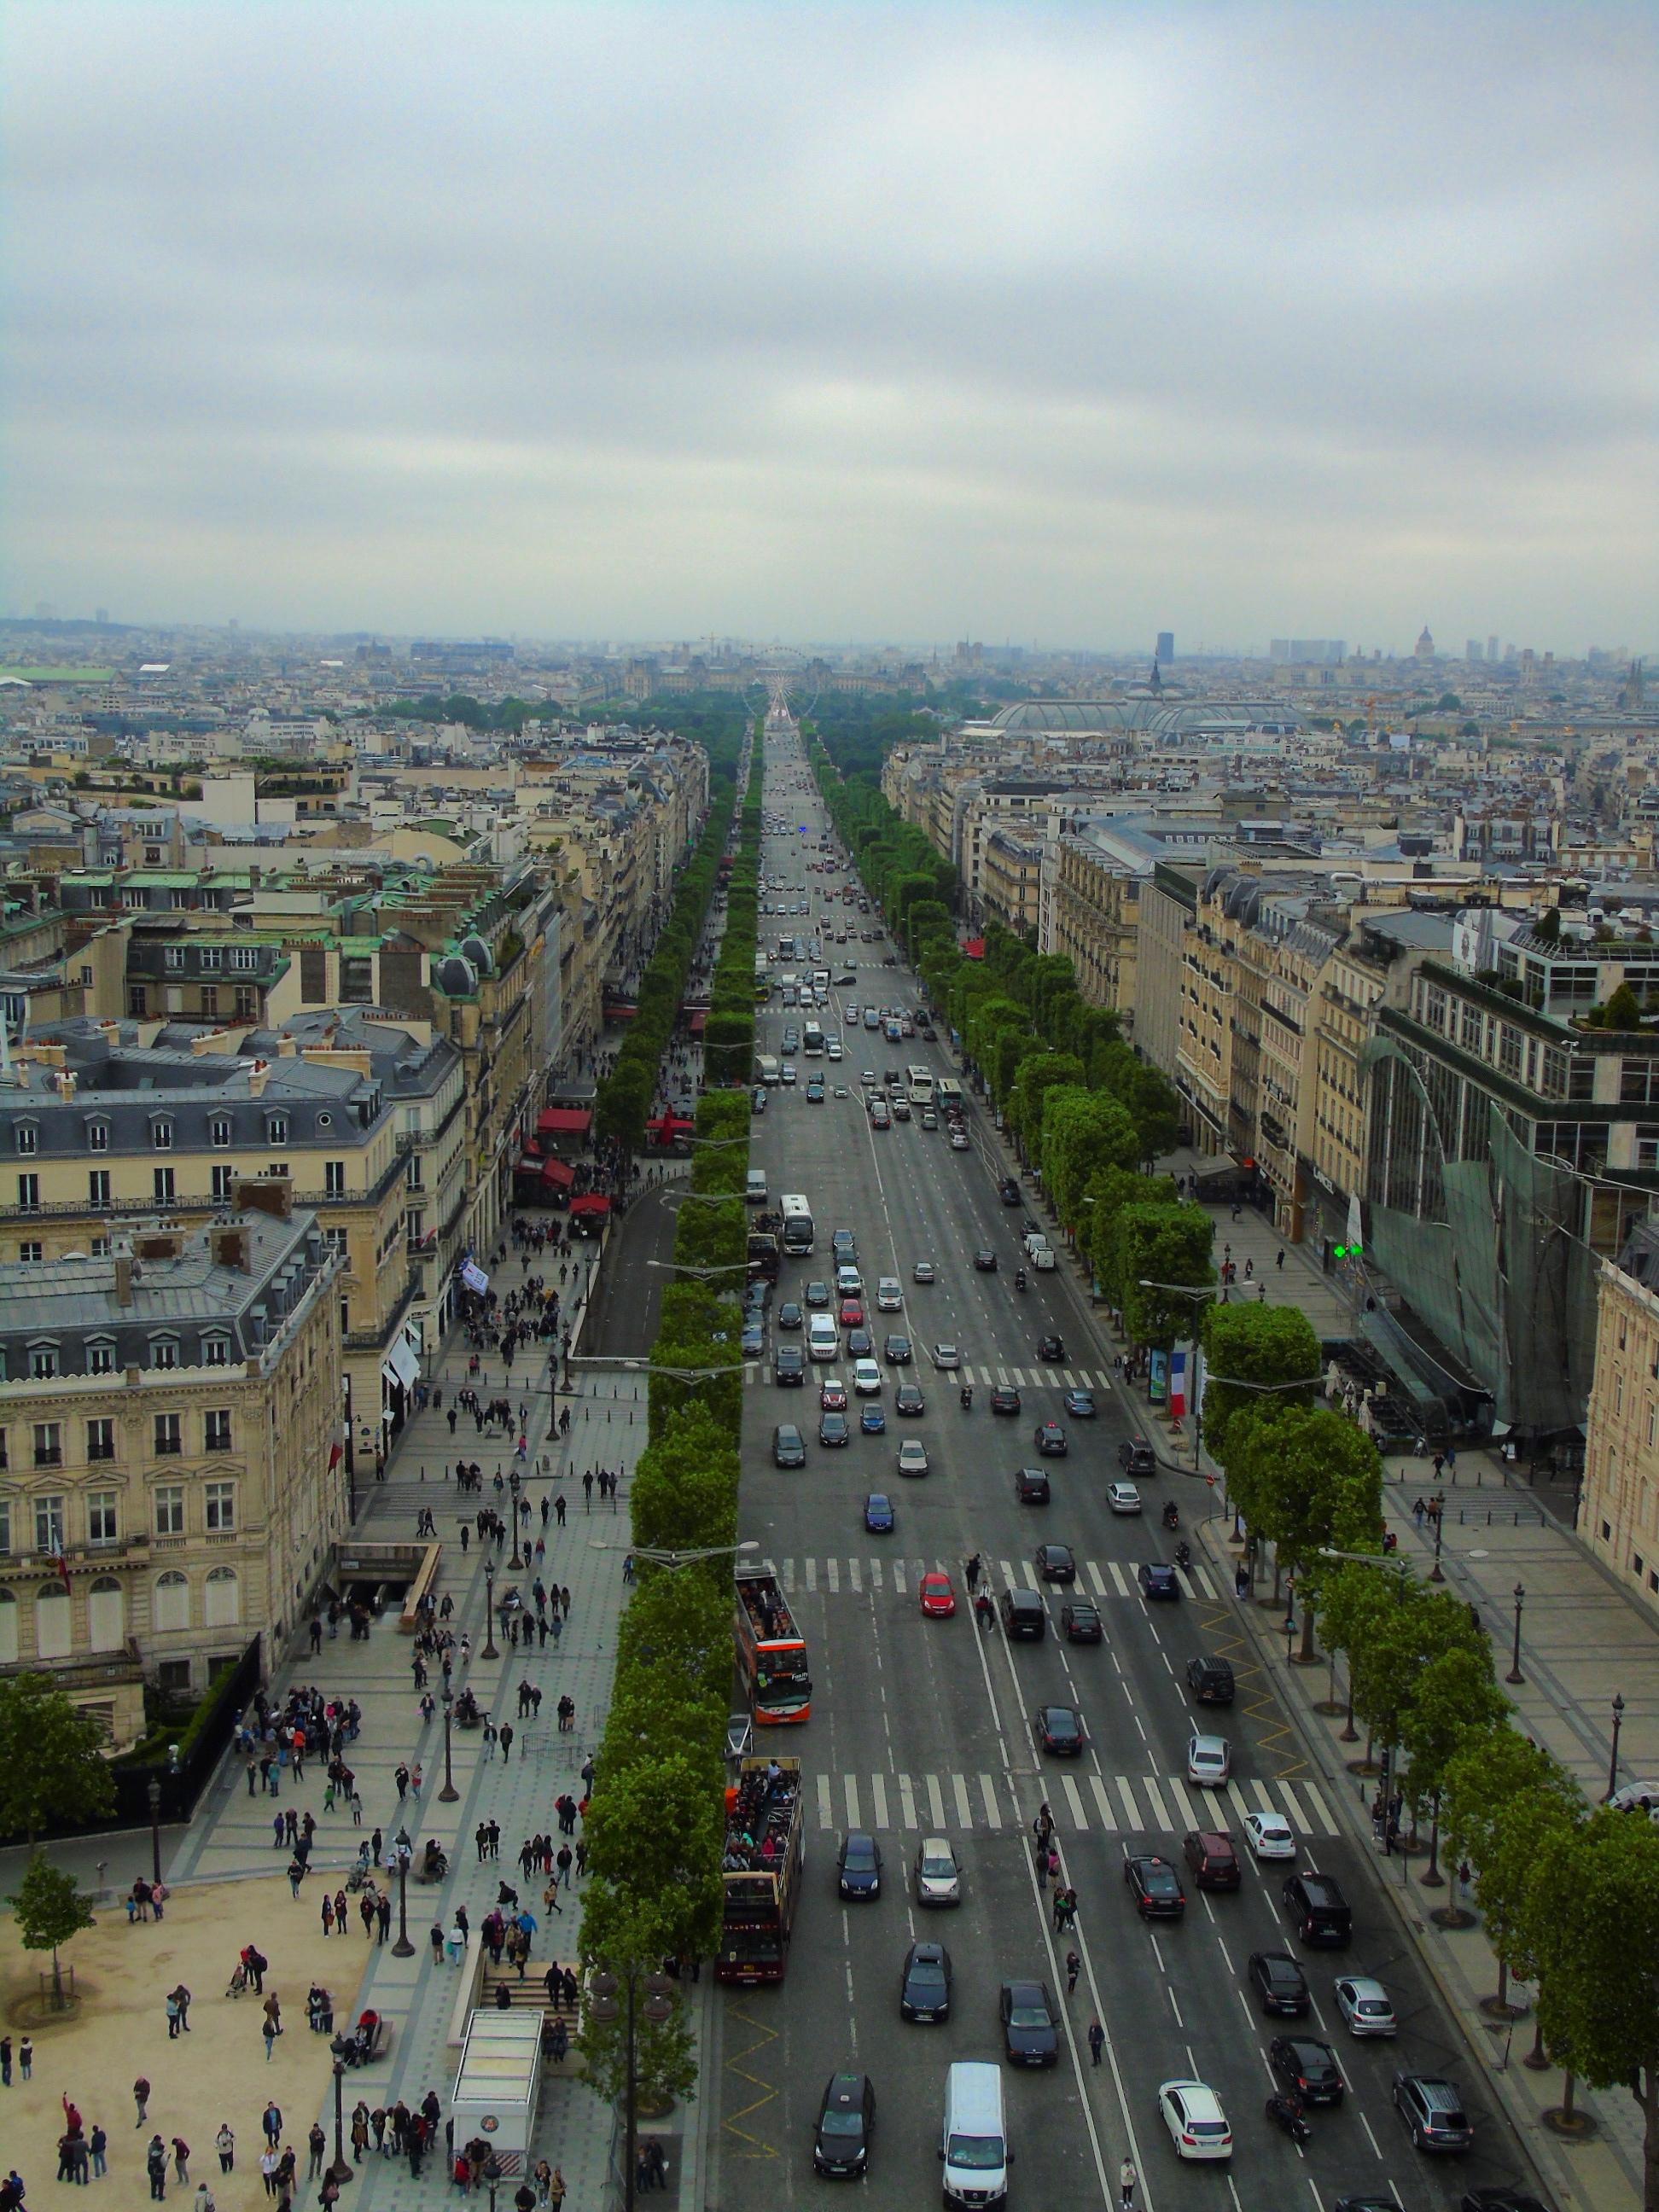 I migliori punti panoramici di parigi partiamo for Quartiere moderno parigi